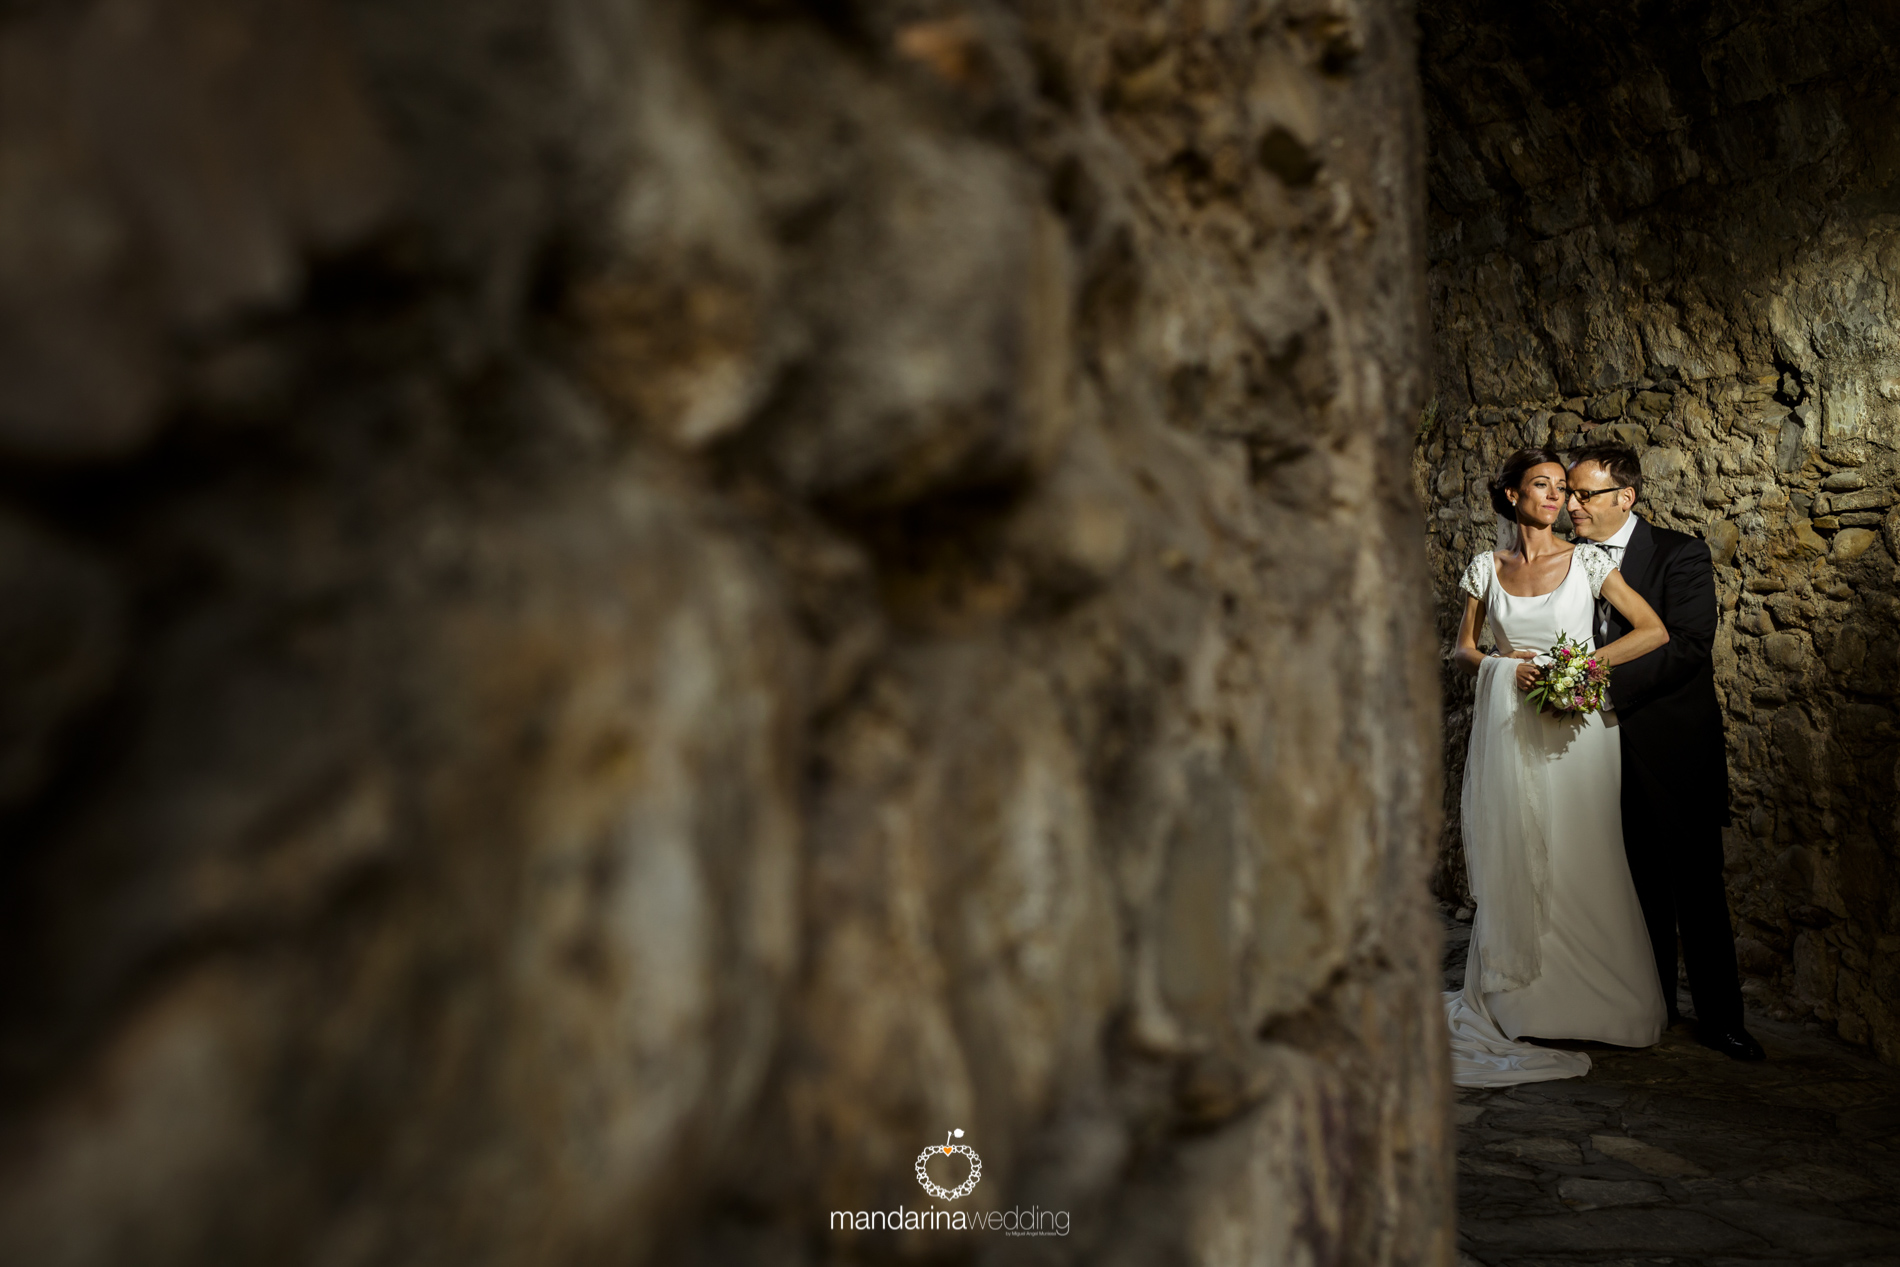 mandaria wedding, fotografos de boda, fotoperiodismo de boda, mejores fotografos de boda, bodas soria, bodas pirineo, bodas Madrid, fotógrafos tarragona_07